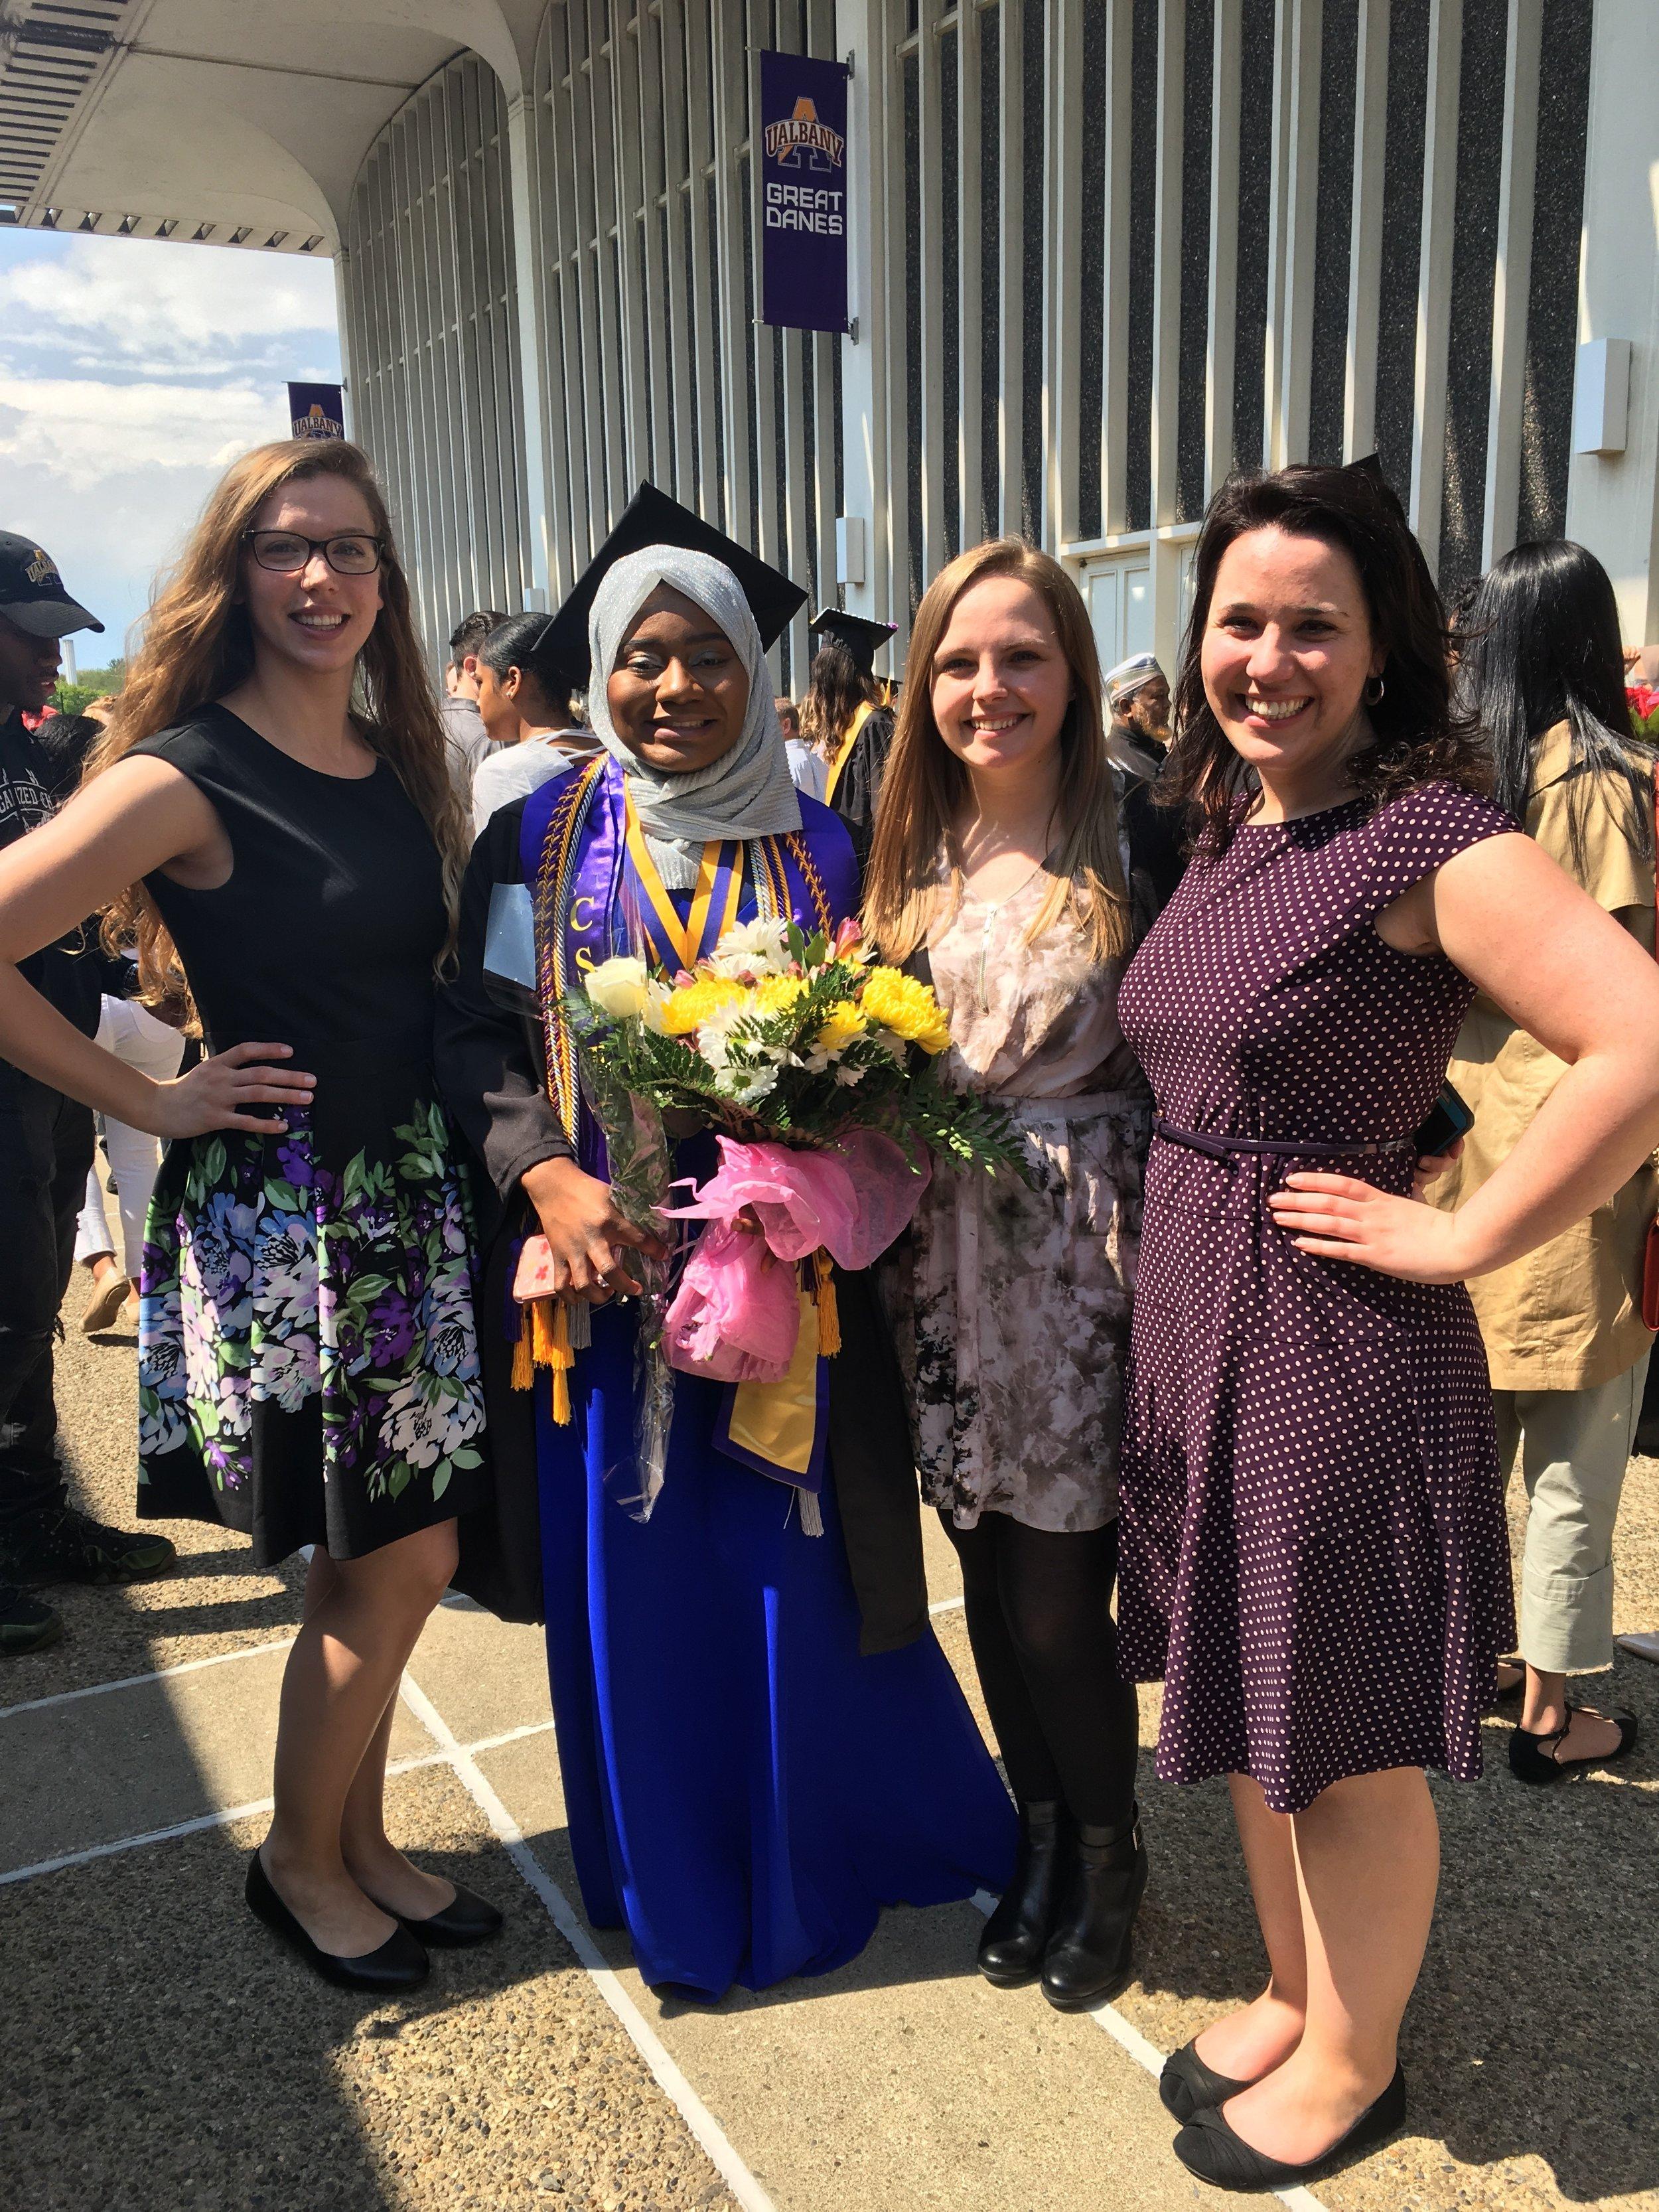 Kristen, Meghan and Allix celebrating with Nana-Hawwa.